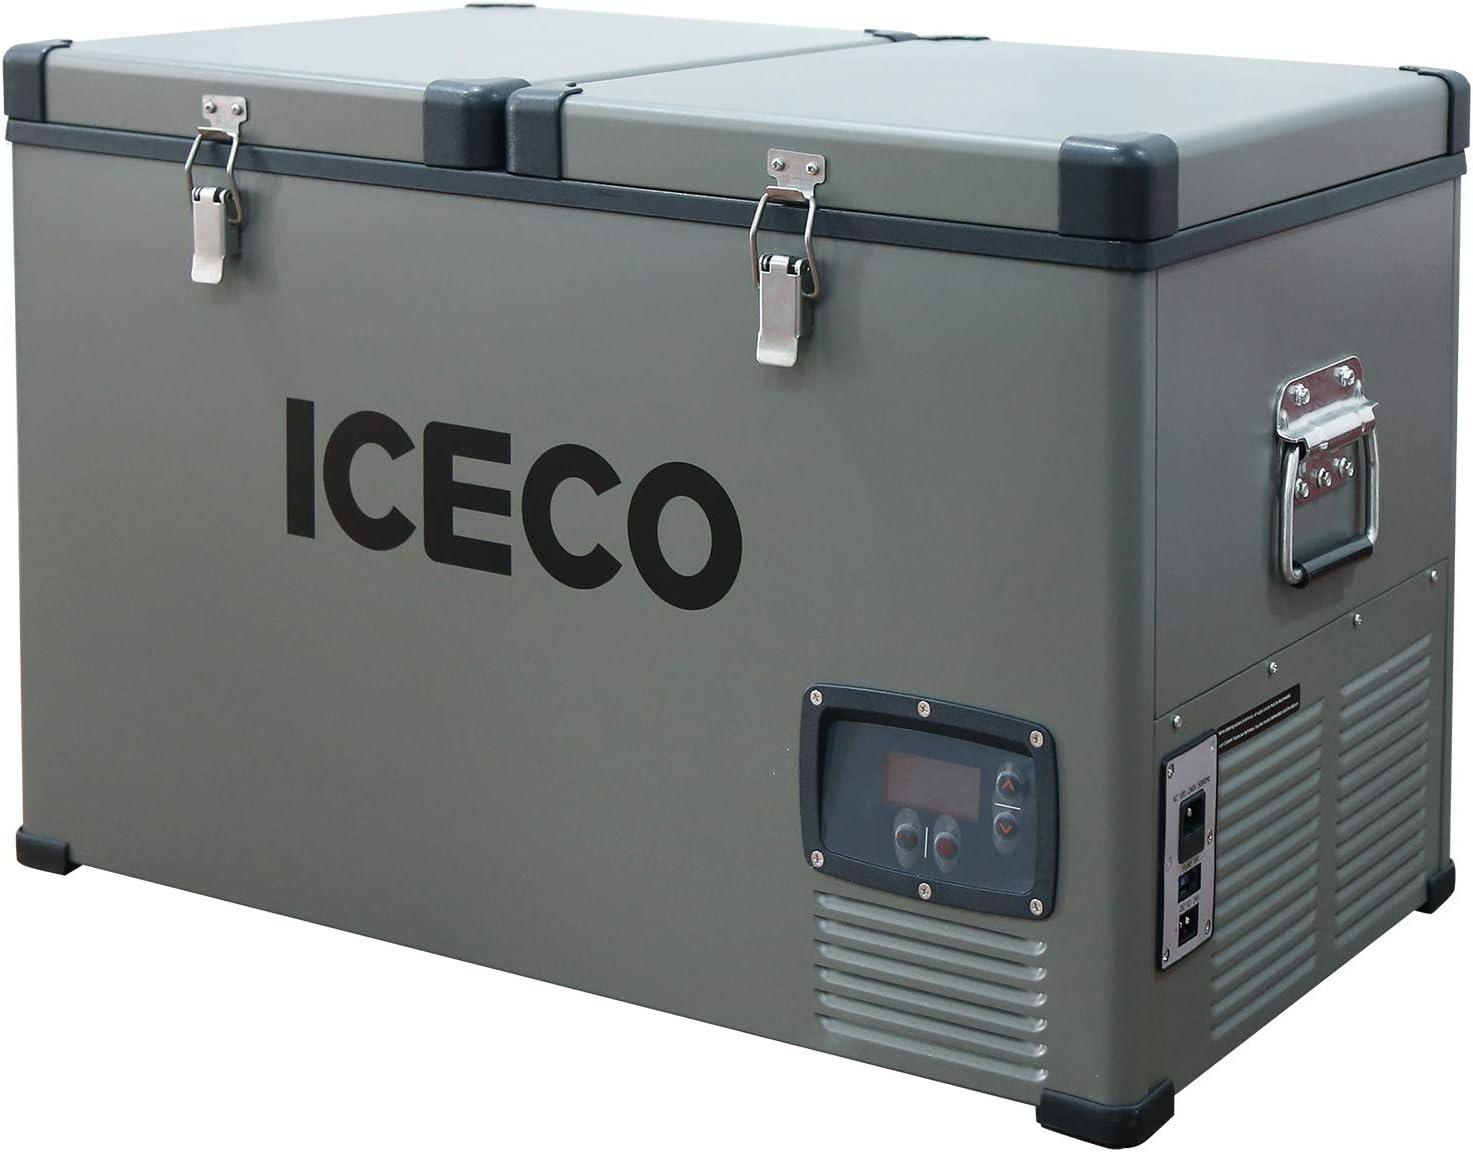 ICECO VL65 68 Quart Dual Zone Portable Refrigerator with SECOP Compressor, 65 Liters Deep Freezer, DC 12/24V, AC 110-240V, 0℉ to 50℉, Home & Car Use (without Insulate Cover)